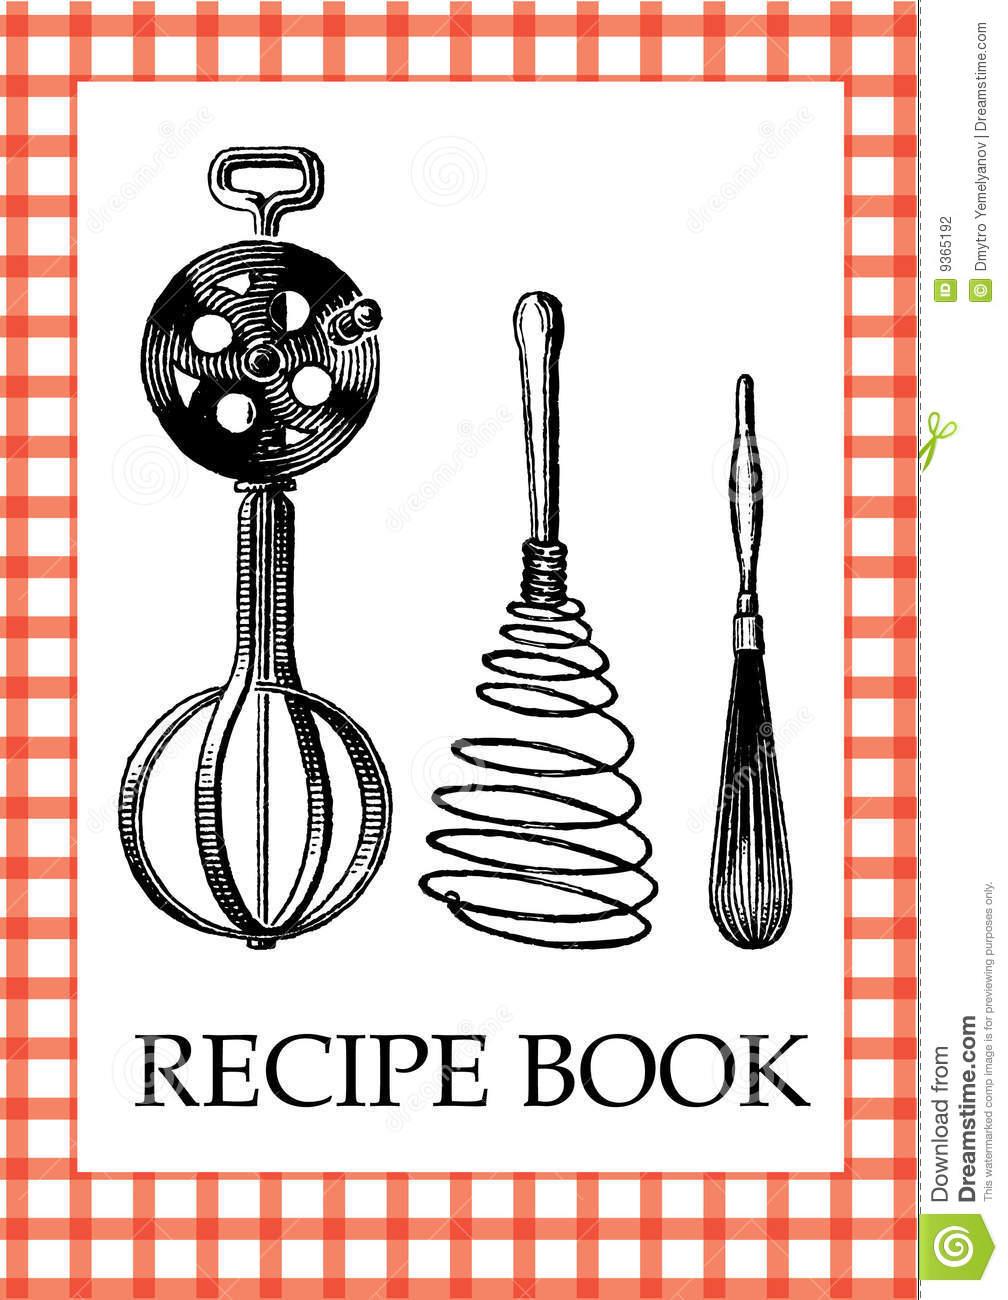 Recipe book cover clipart clip art free Cookbook Cover Clipart - Clipart Kid clip art free